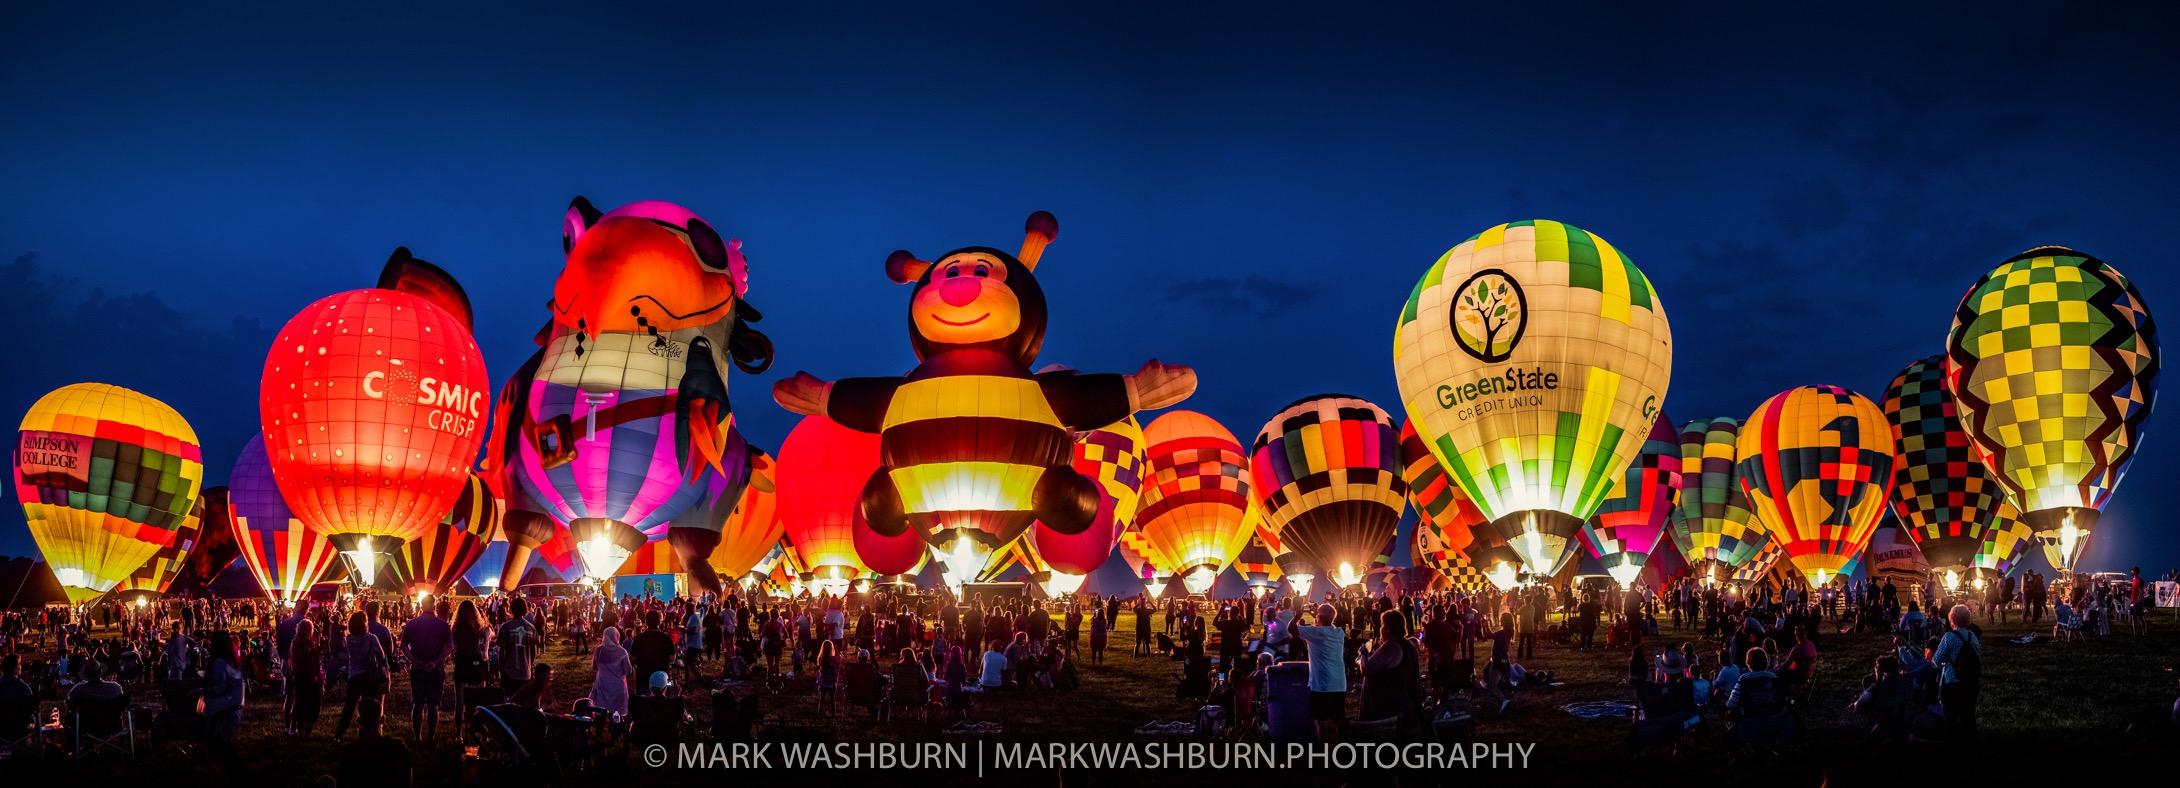 Night glow balloons 21 2